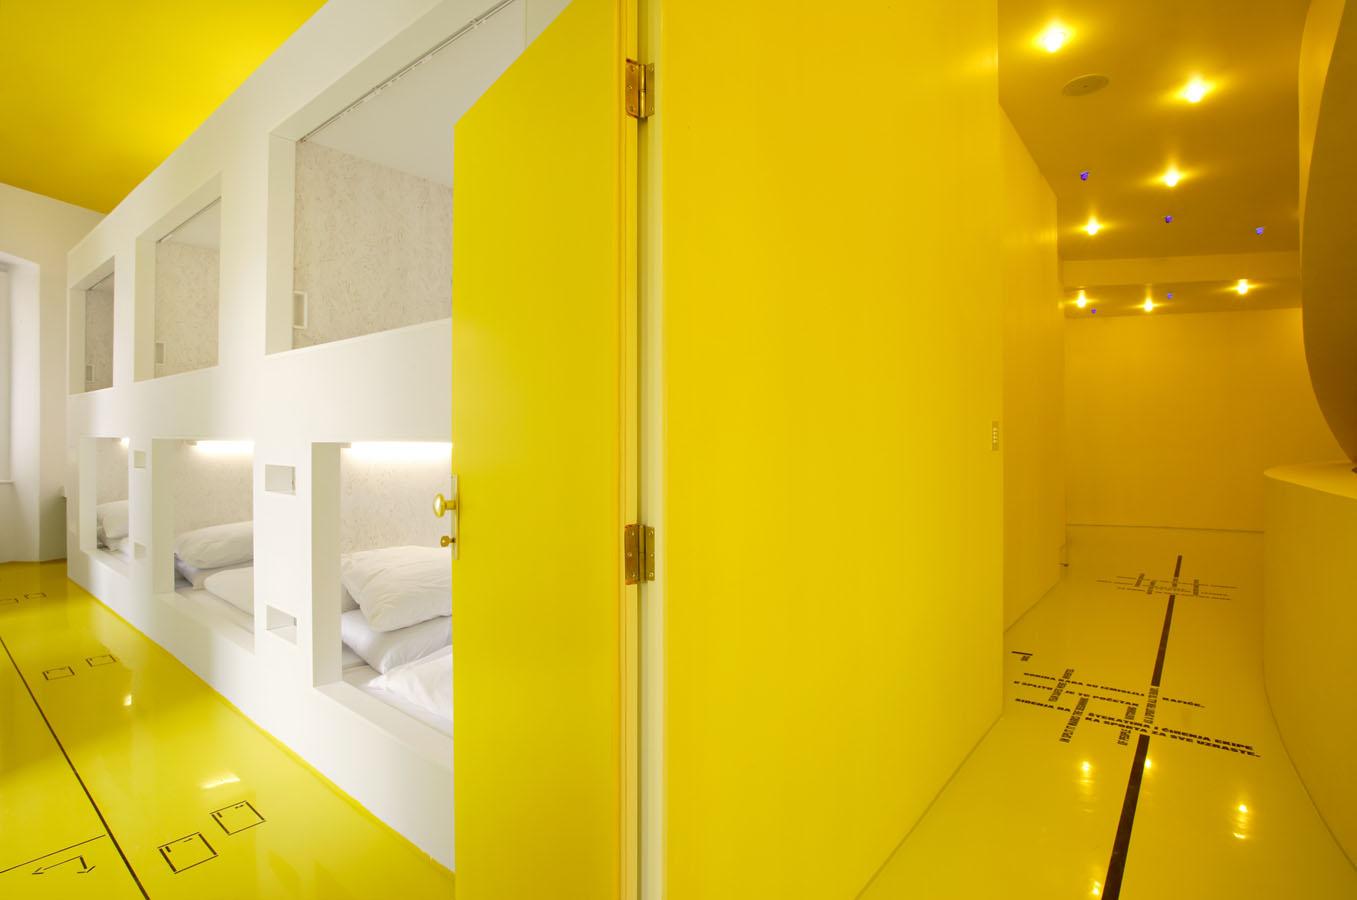 hostel golly bossy by studio up 11 Hostel Golly±Bossy By Studio Up